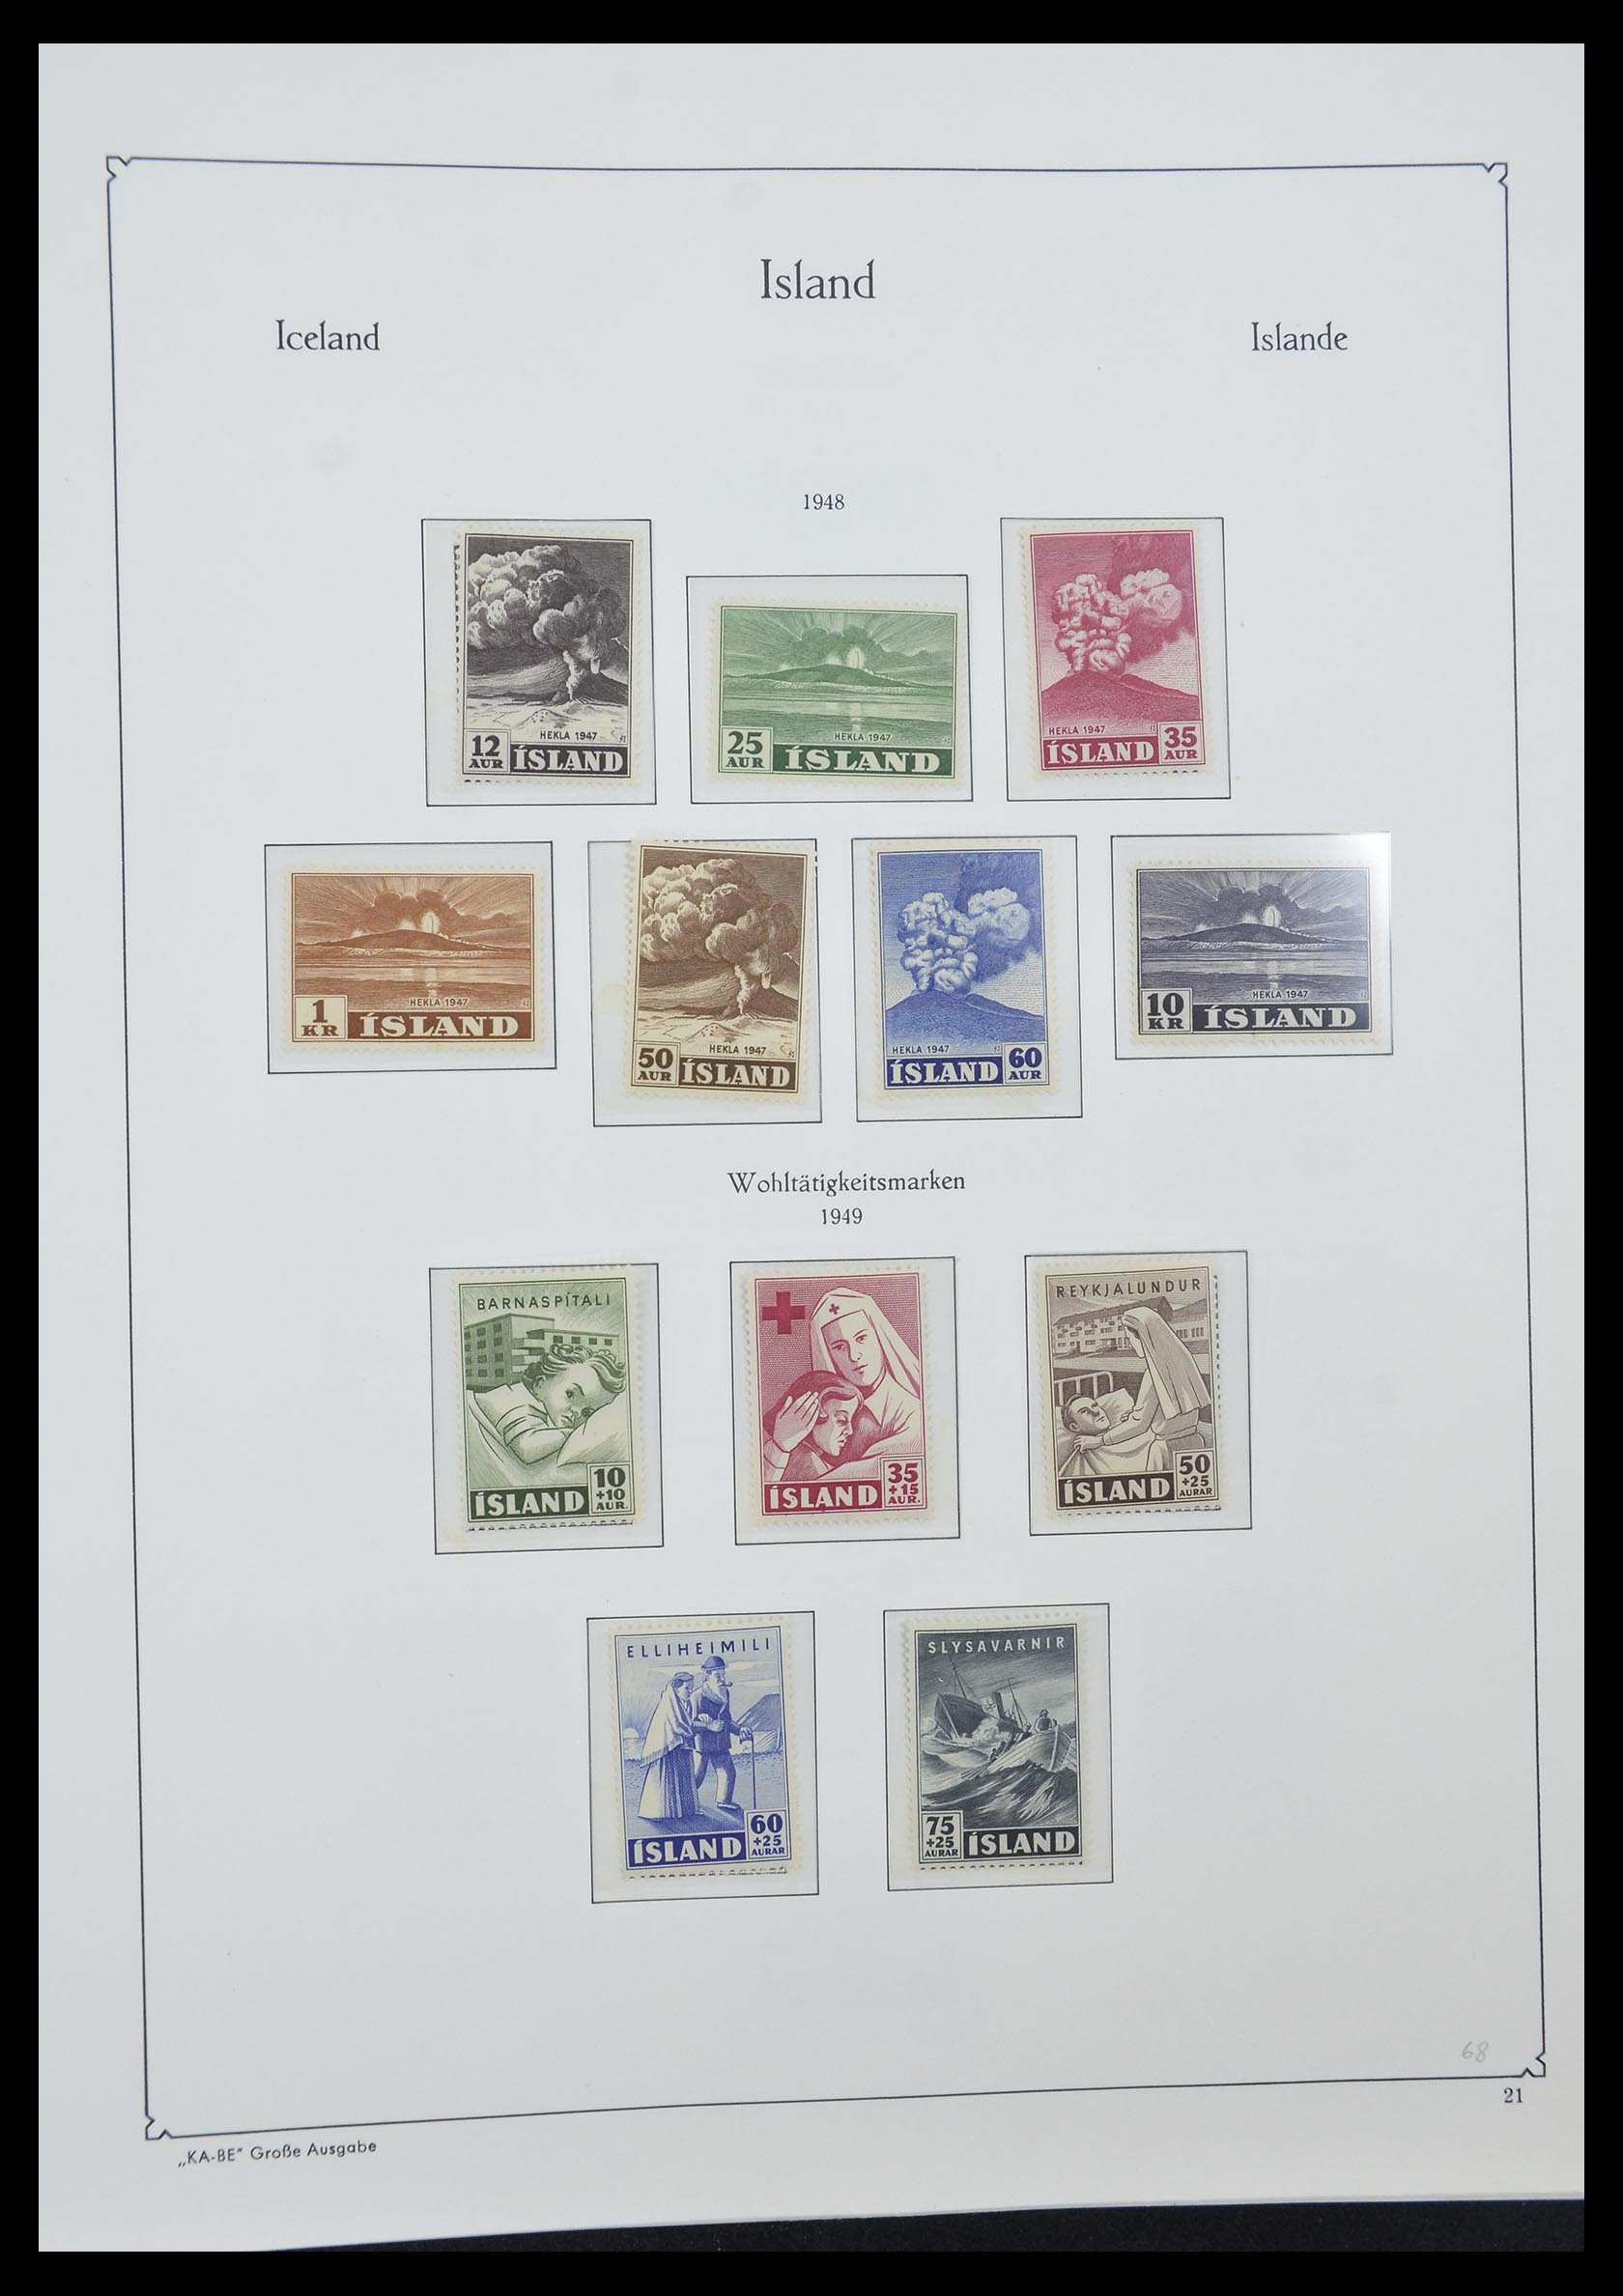 33185 004 - Postzegelverzameling 33184 Finland 1856-1990.